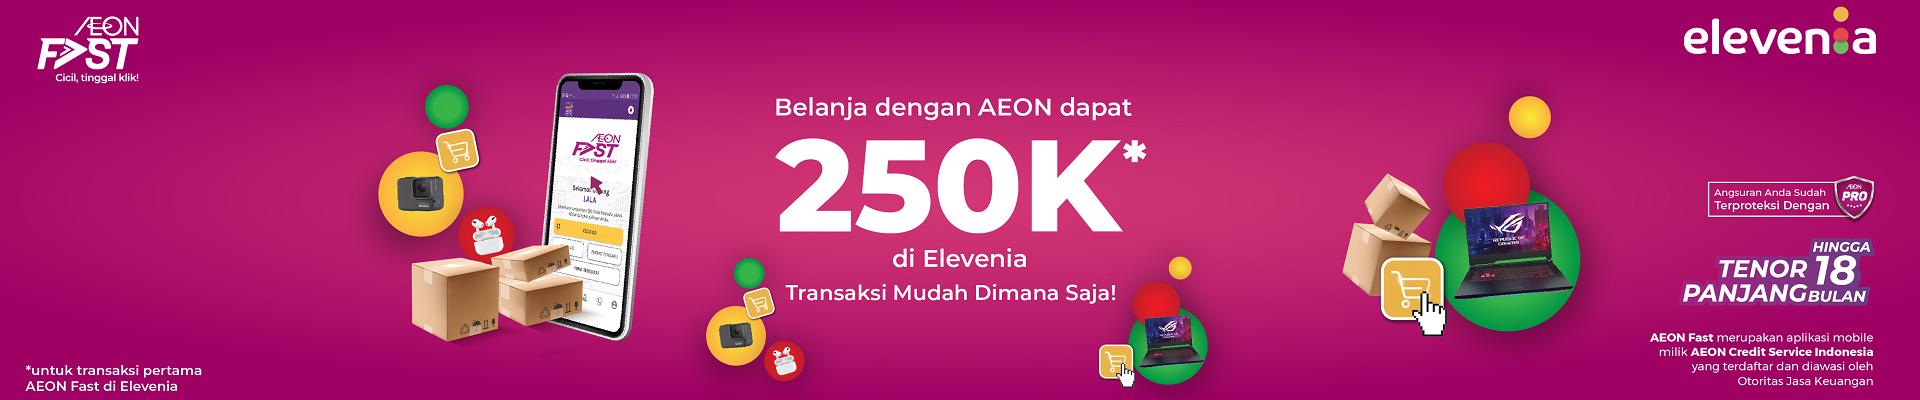 Dapatkan Cashback 250K di Elevenia dengan AEON Fast